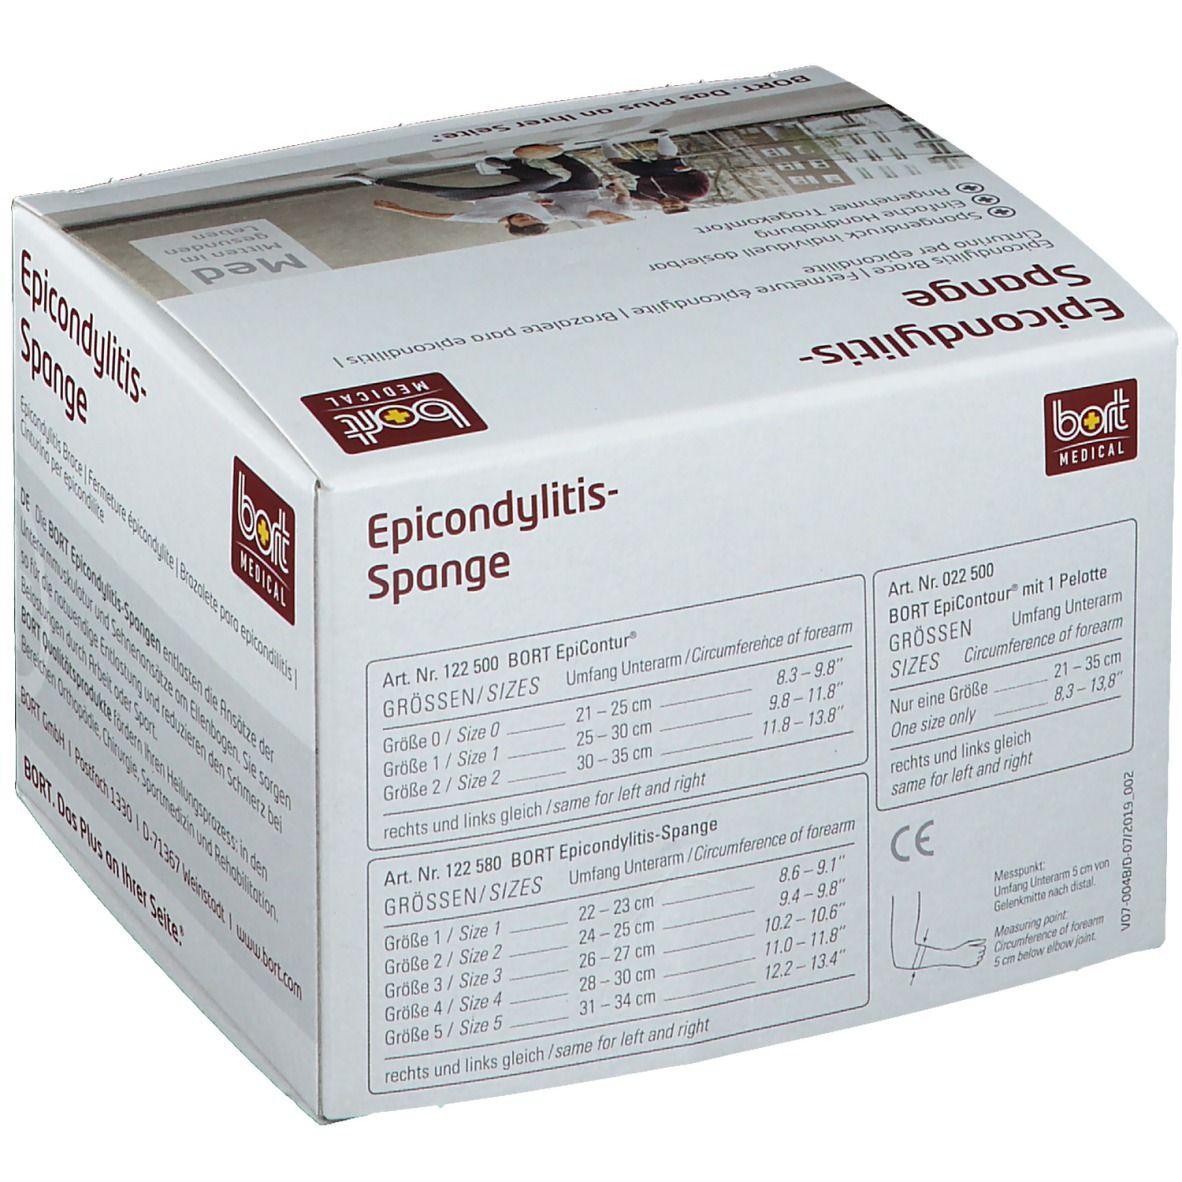 BORT Stabilo® Epicondylitis-Spange mit ulnarer Entlastung Gr. 1 grau